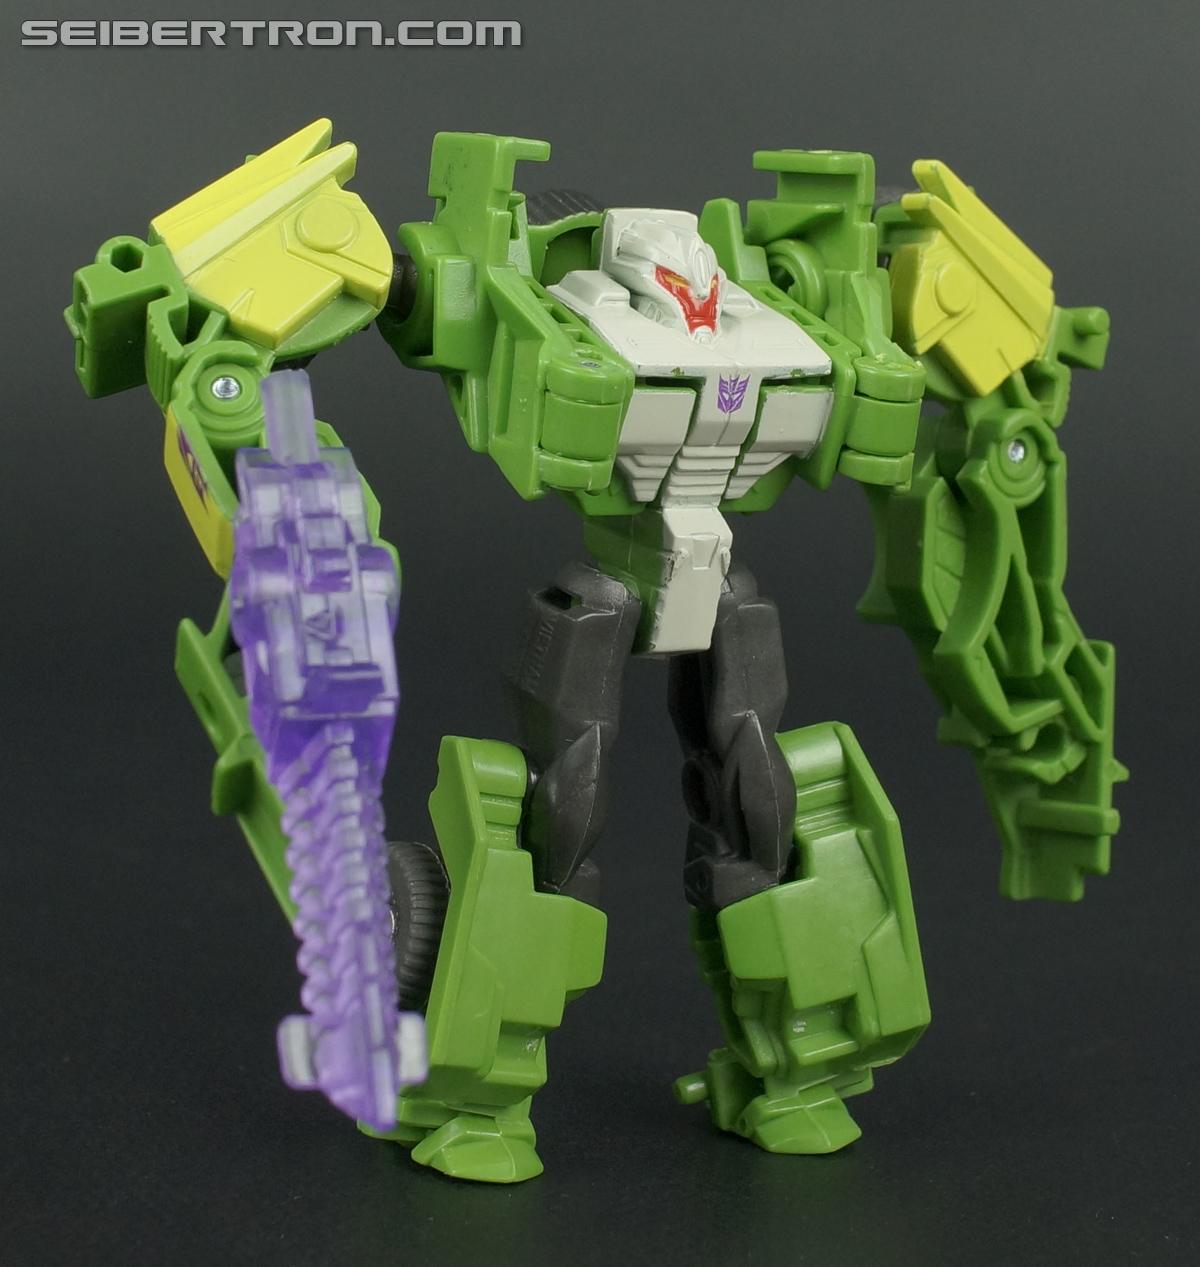 Transformers Prime Beast Hunters Cyberverse Breakdown (Apex Hunter Armor) (Image #46 of 96)